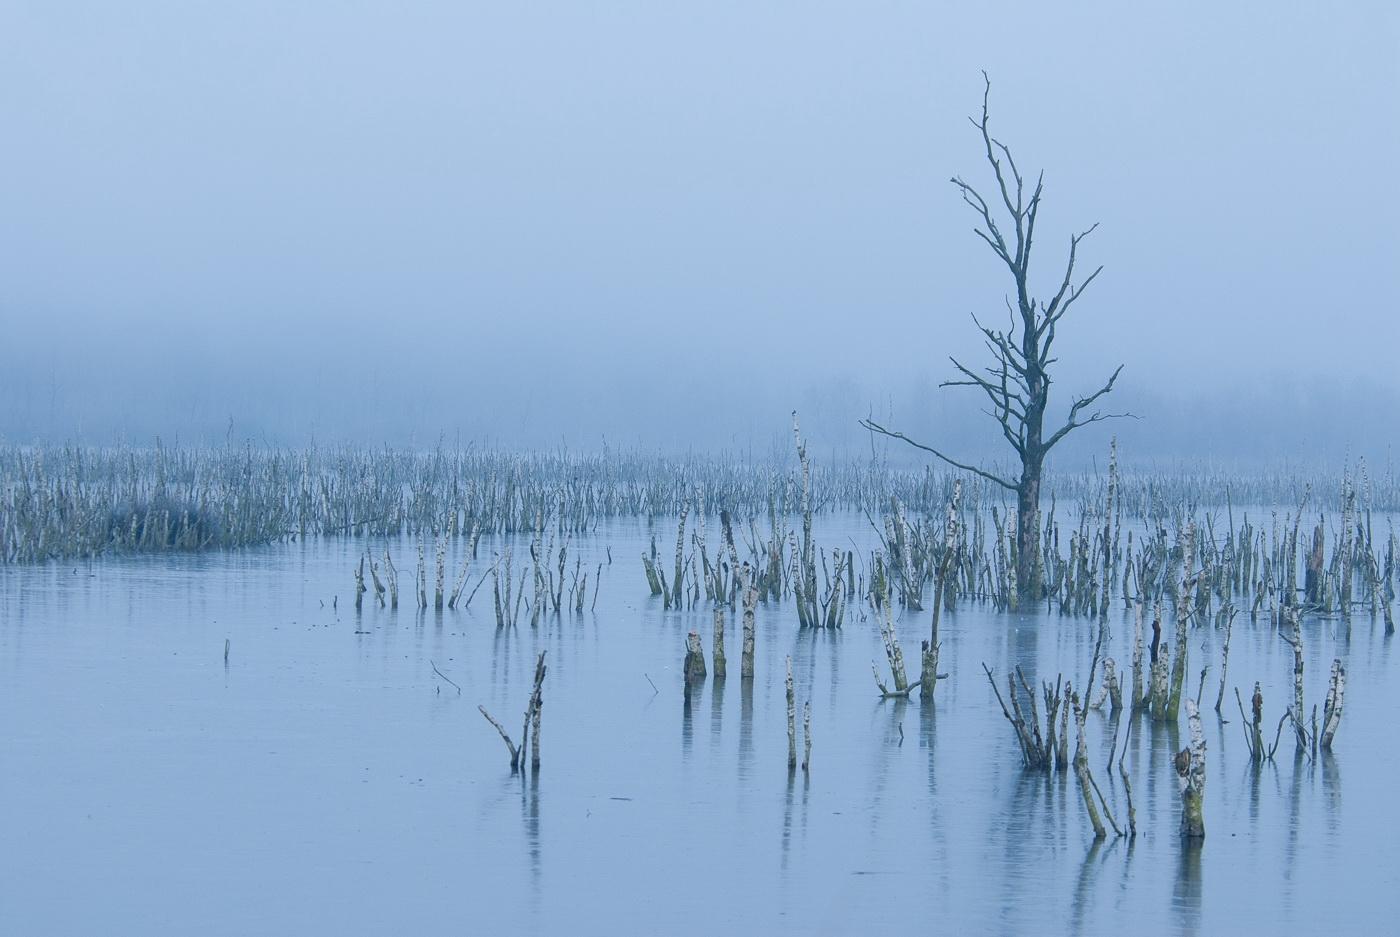 Afgestorven bomen; Dead trees